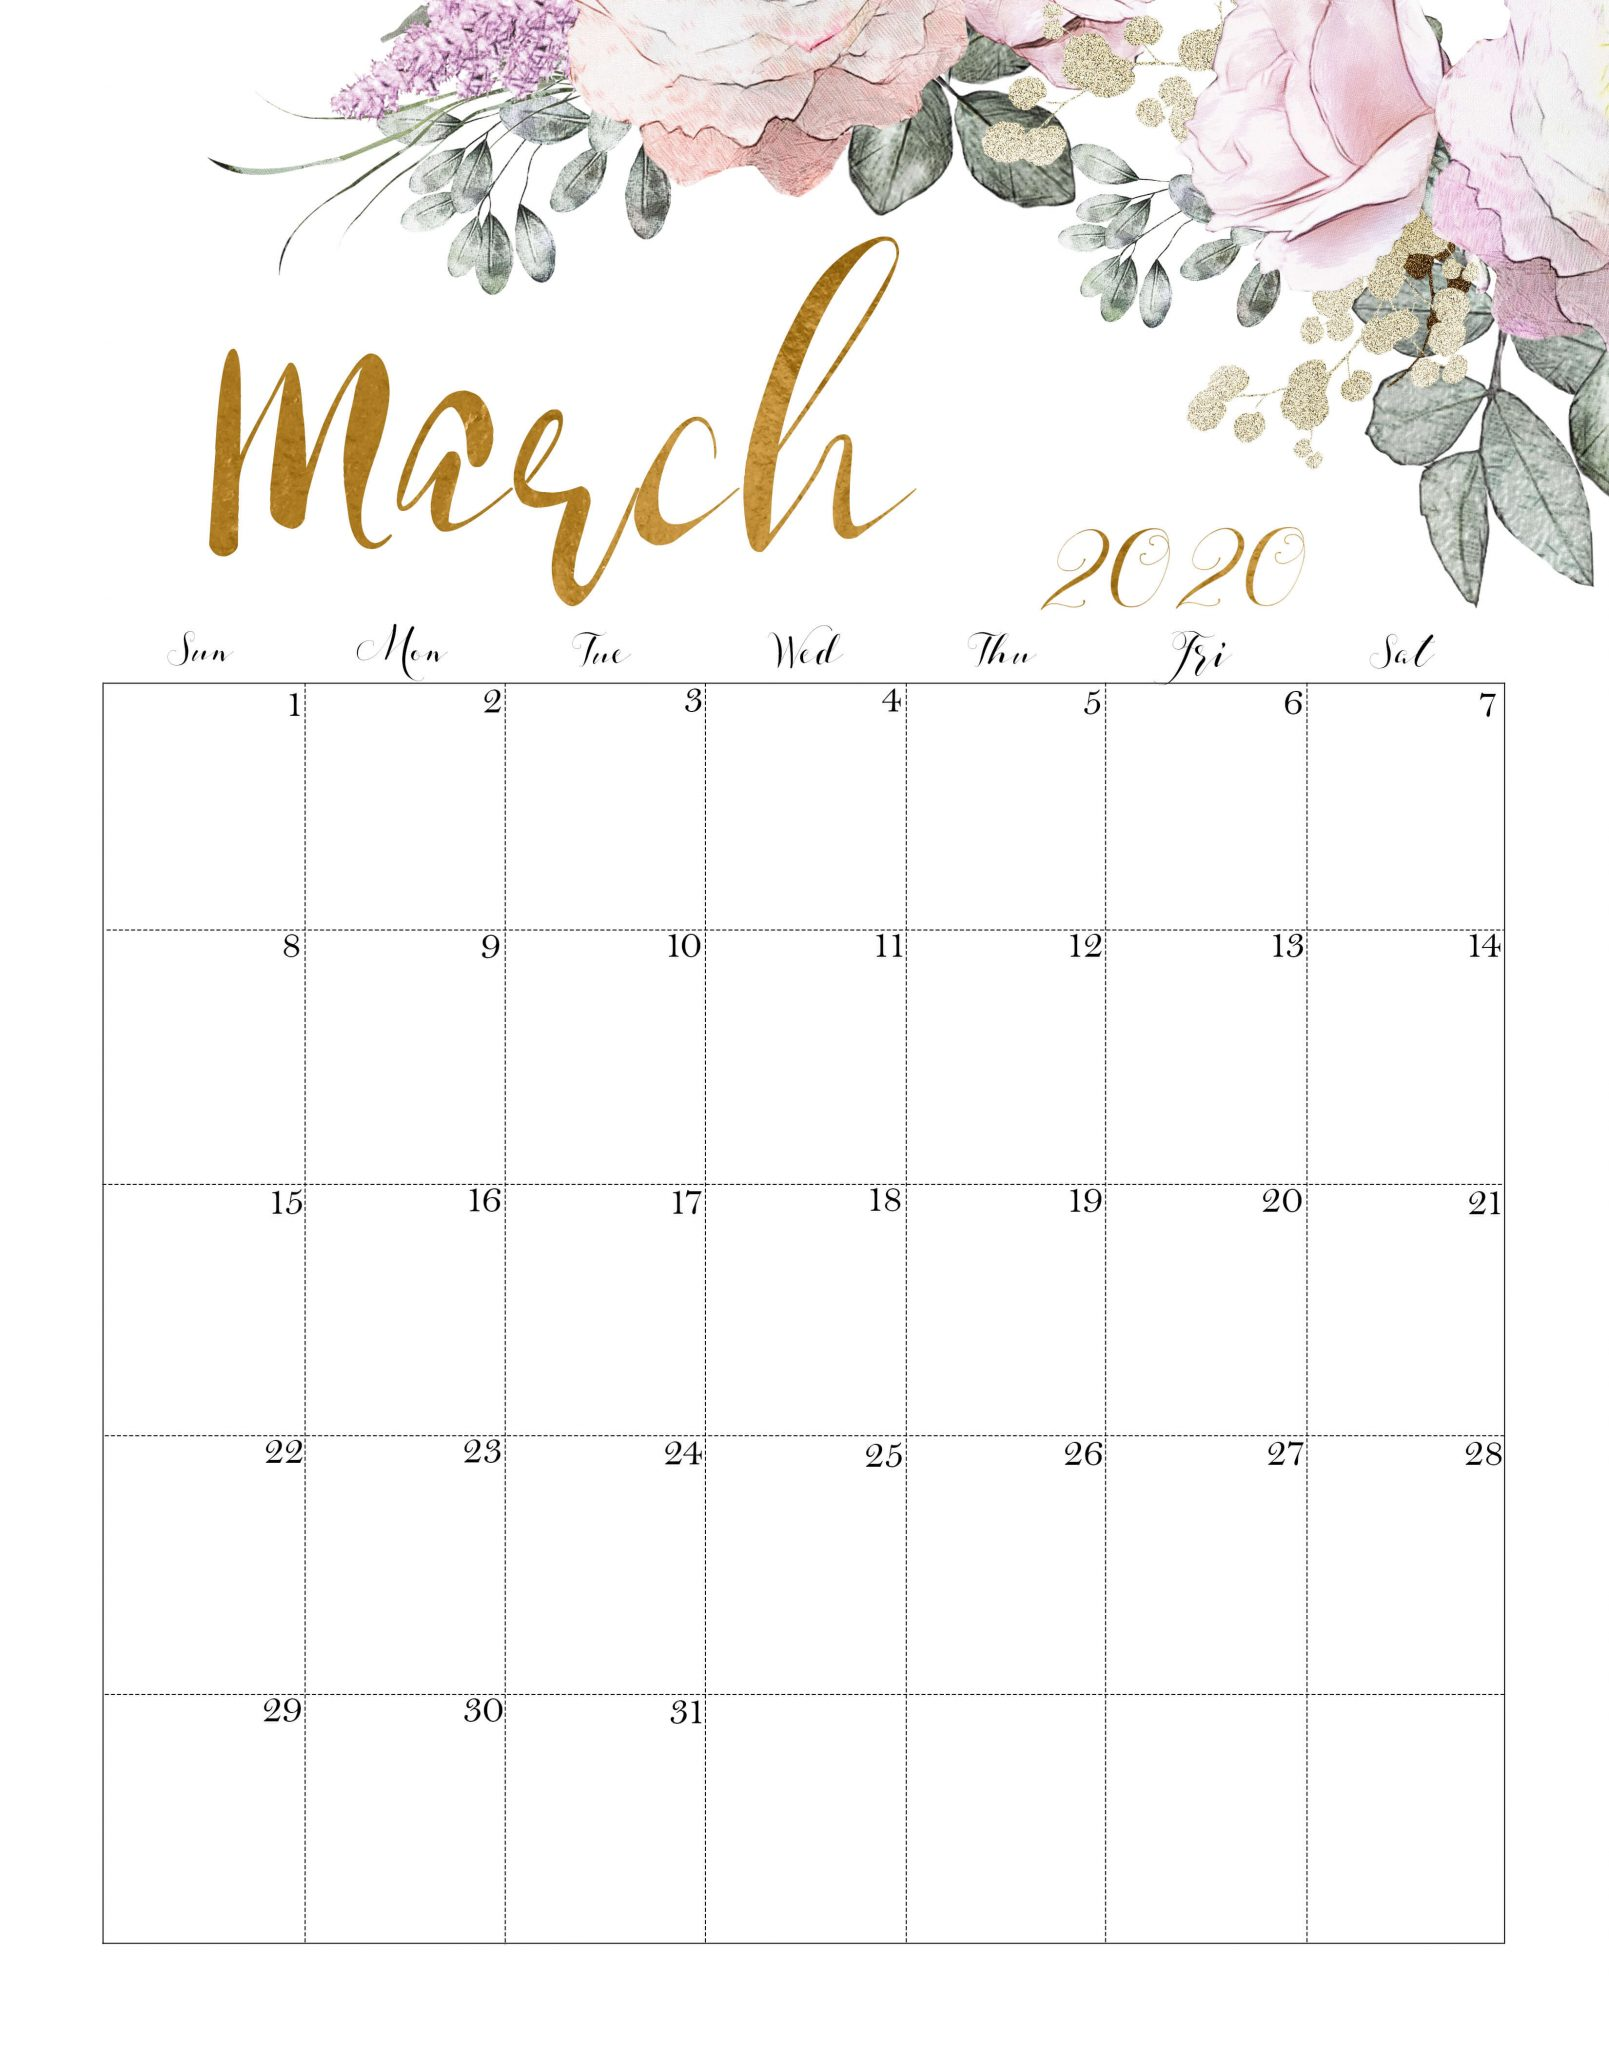 Floral March 2020 Calendar Printable